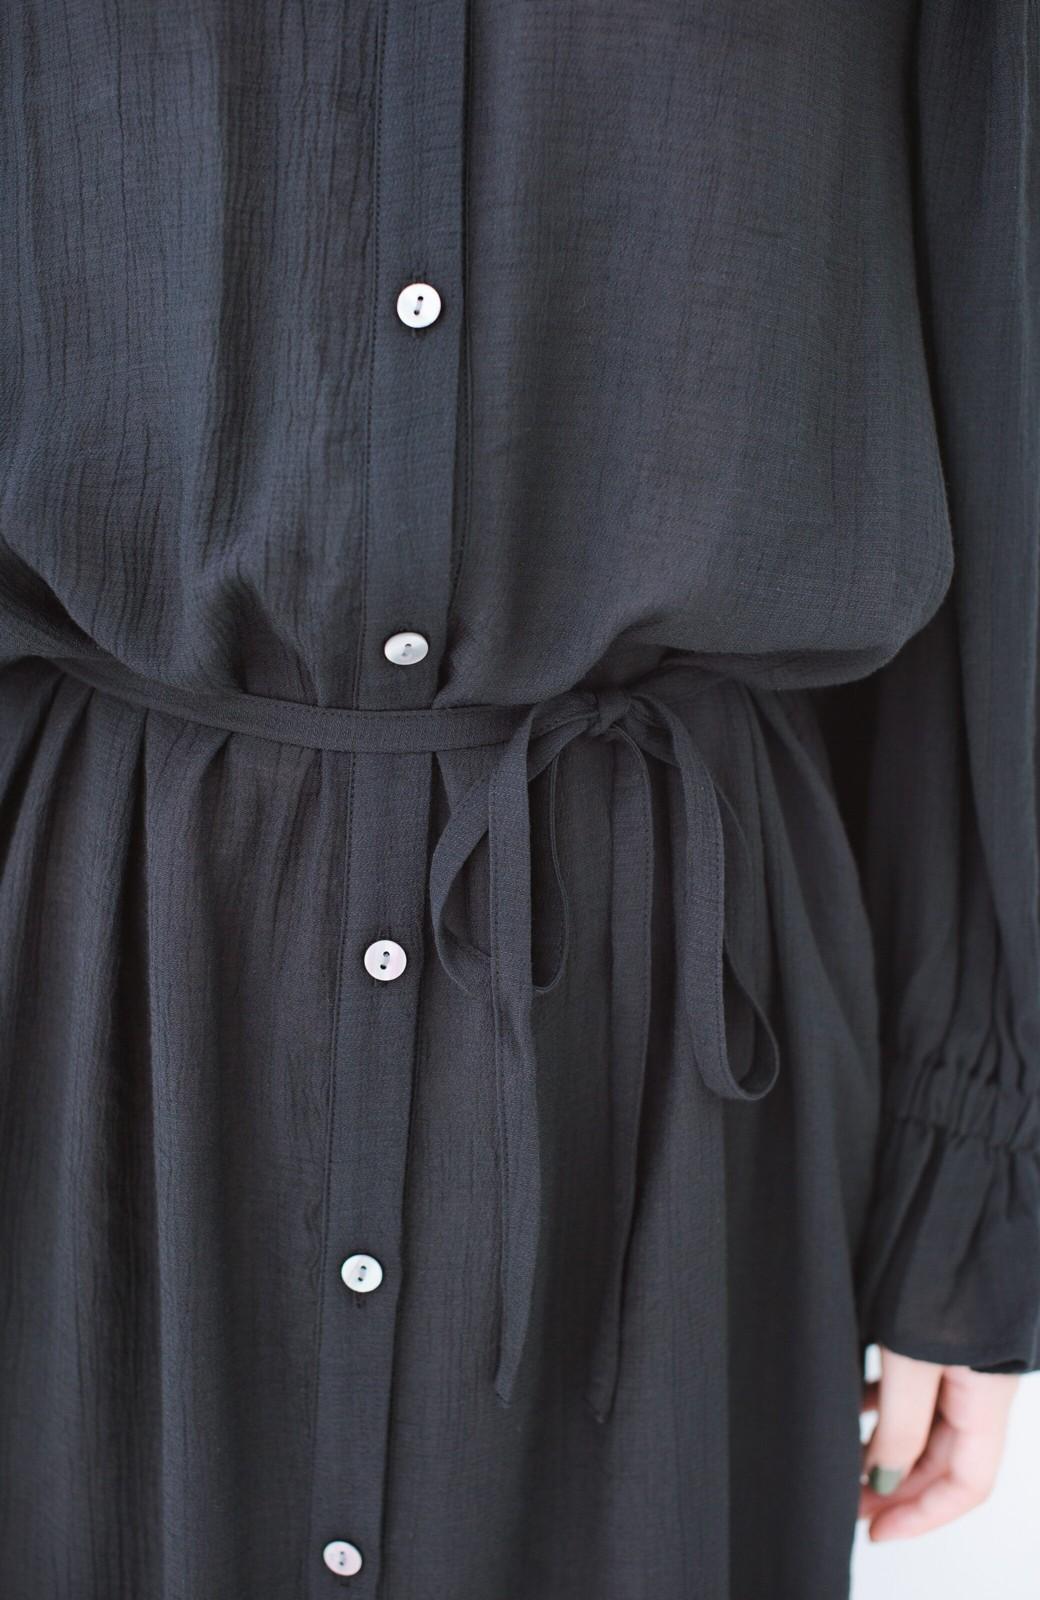 haco! 太ってもばれず 羽織っても便利なウエストリボンワンピース <ブラック>の商品写真6